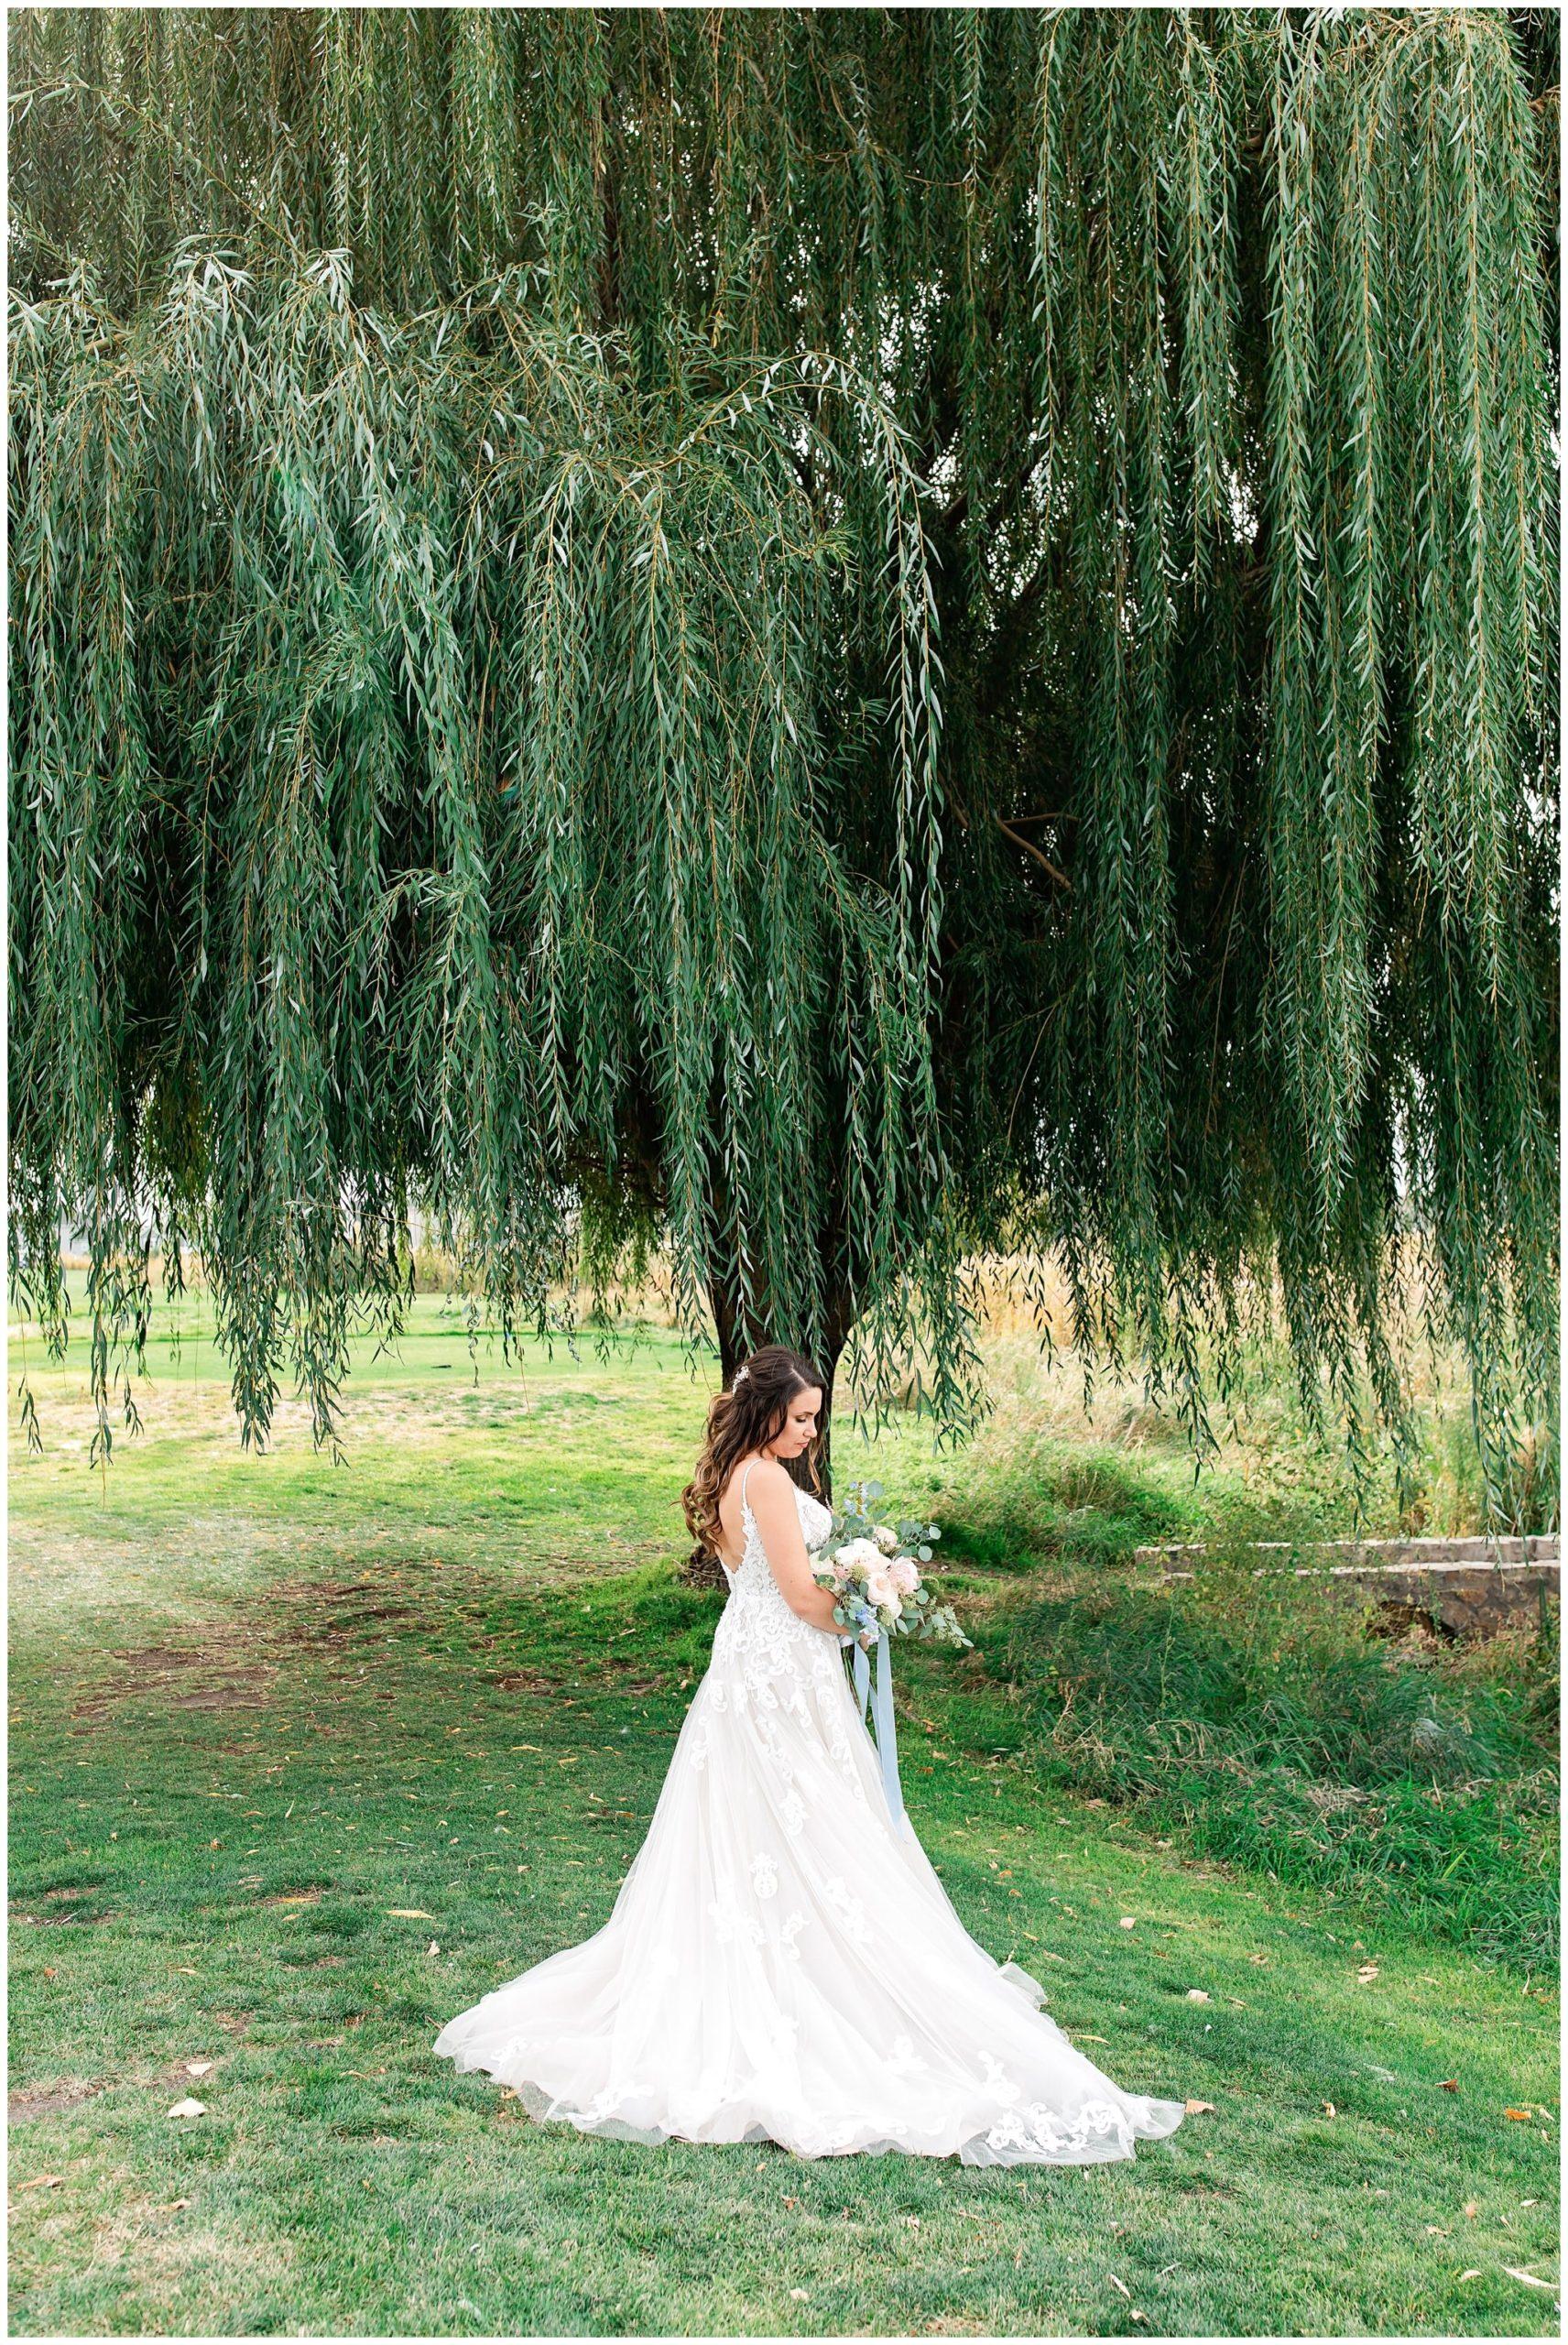 Bridal pictures under willow tree at Sleepy Ridge Wedding Venue